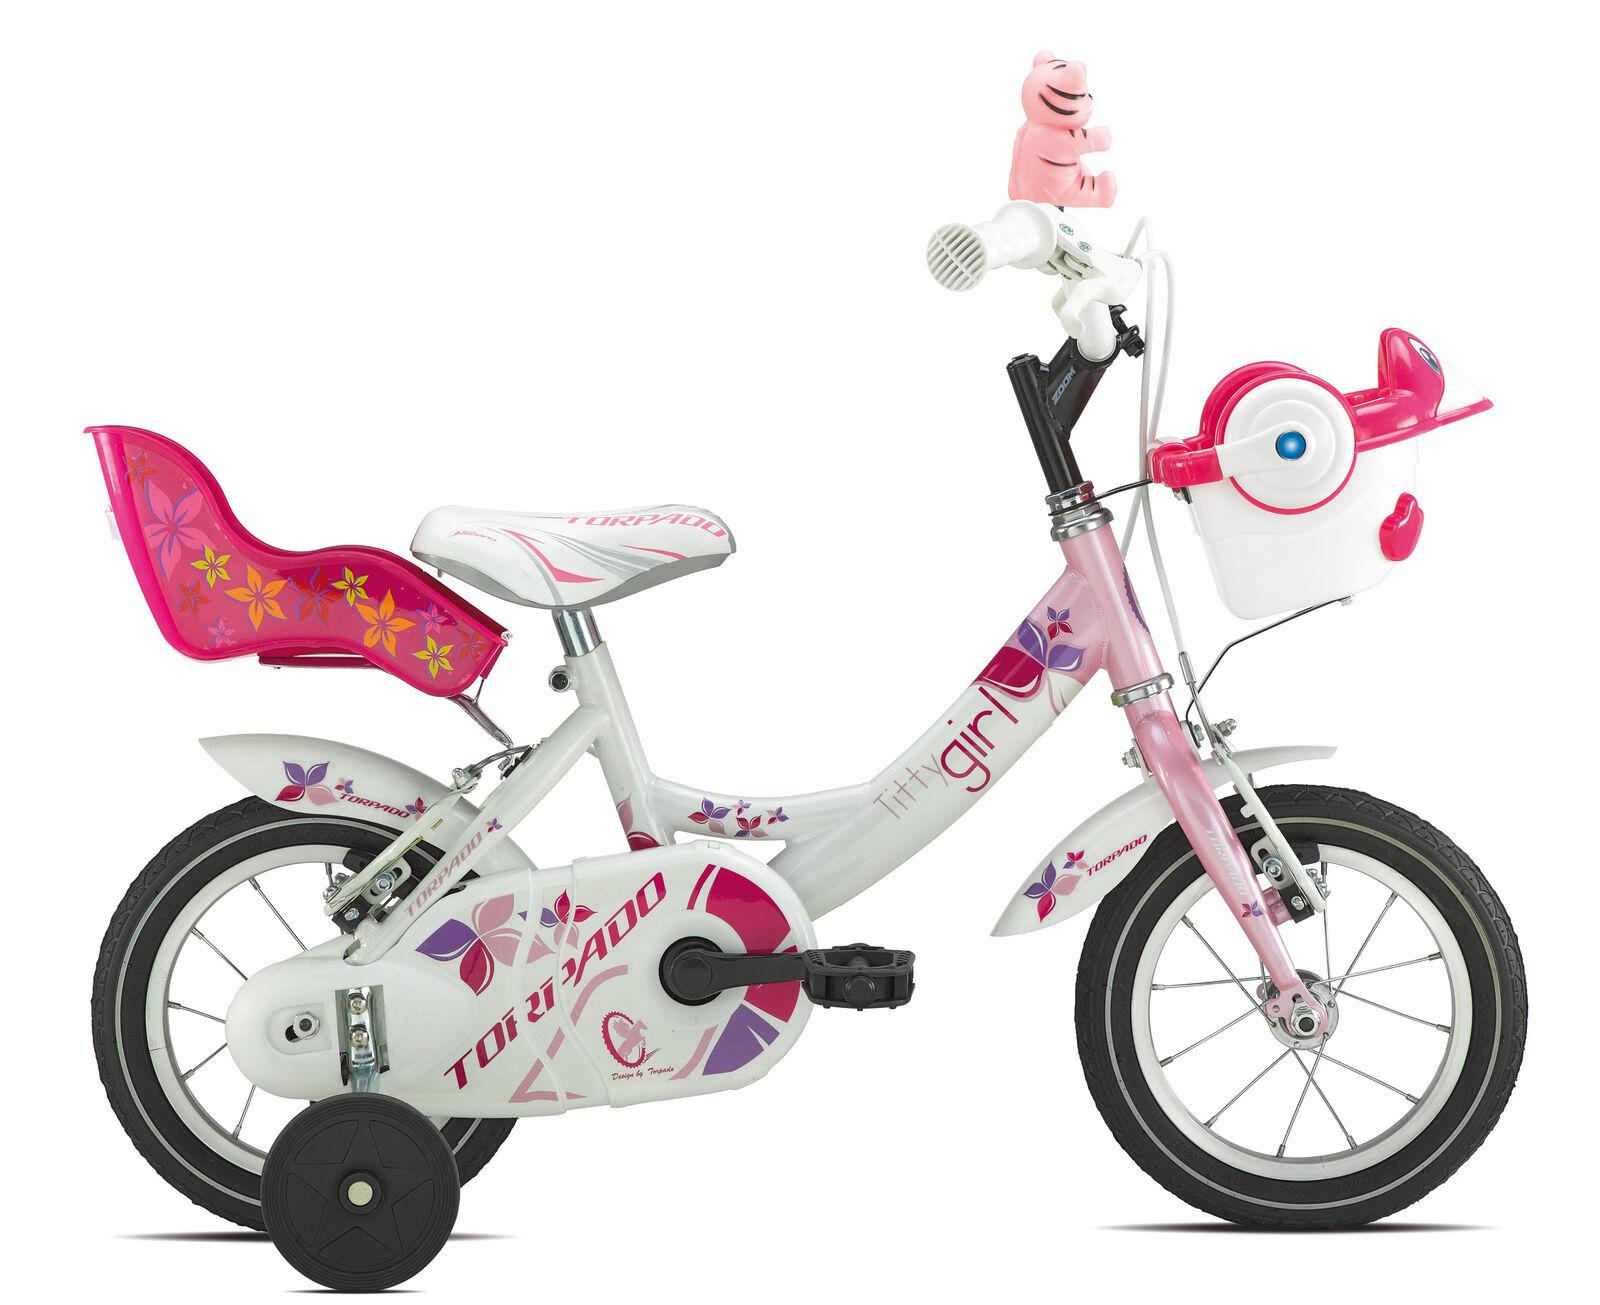 bicycle junior titty 12 rosado girl 1v Blanco rosado 12 Torpado bike ac6b33